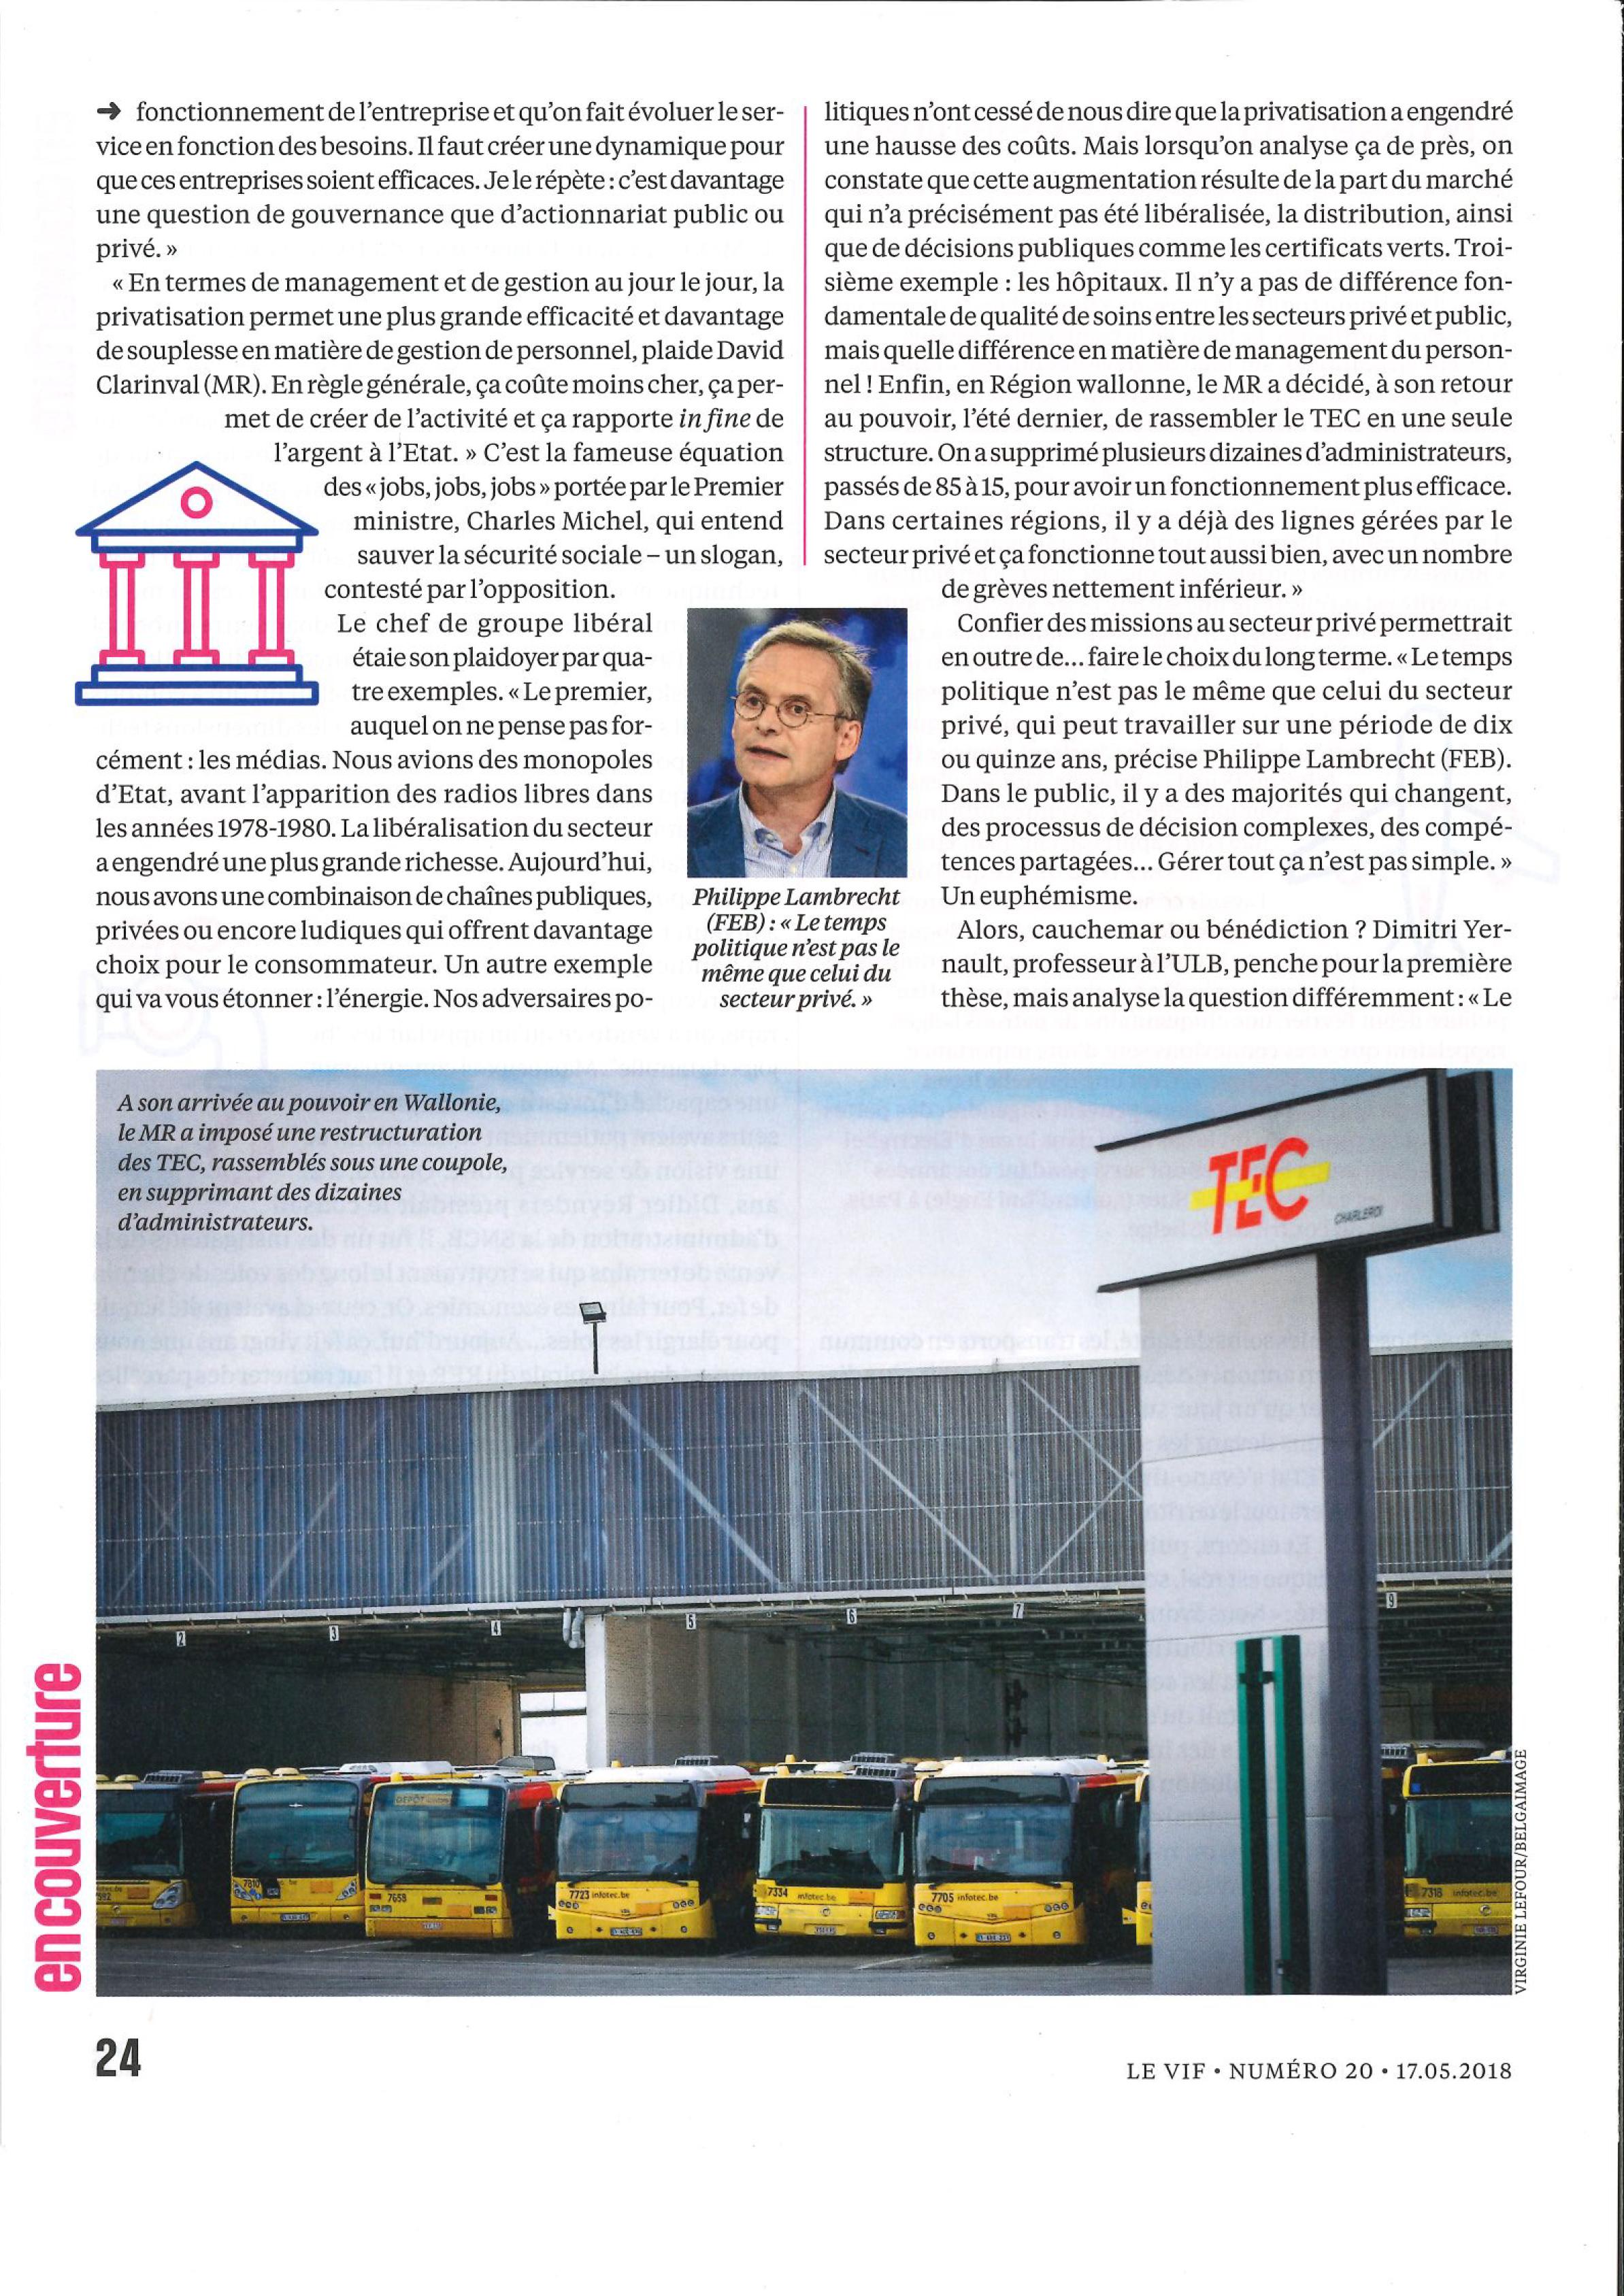 figaro-la-belgique-privatisée-7